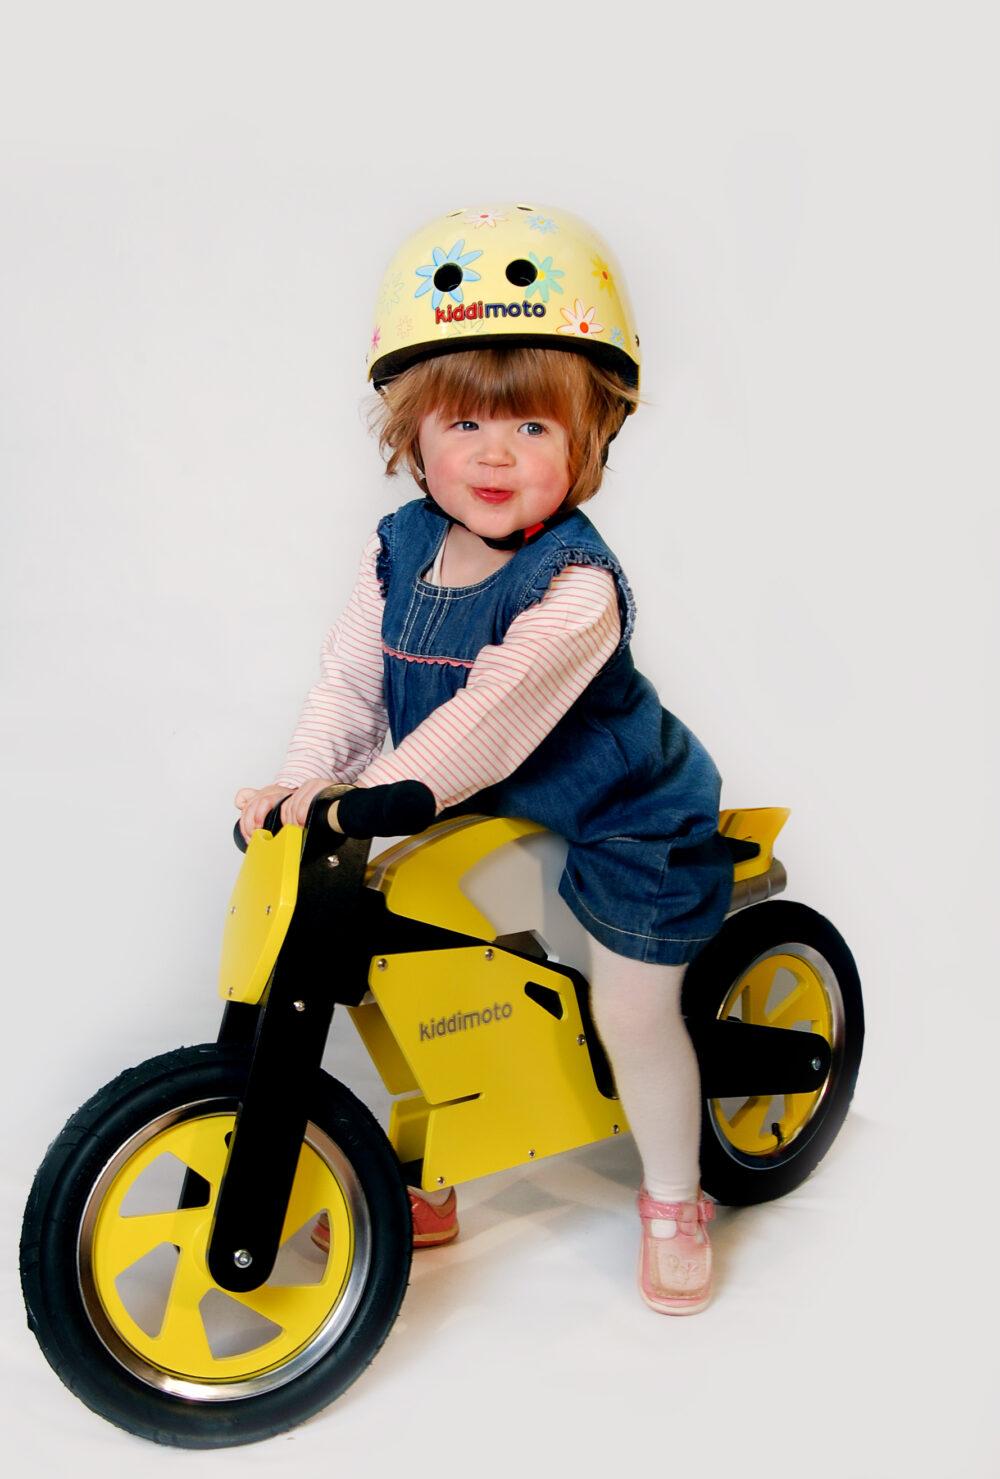 Kiddimoto yellow superbike balance bike